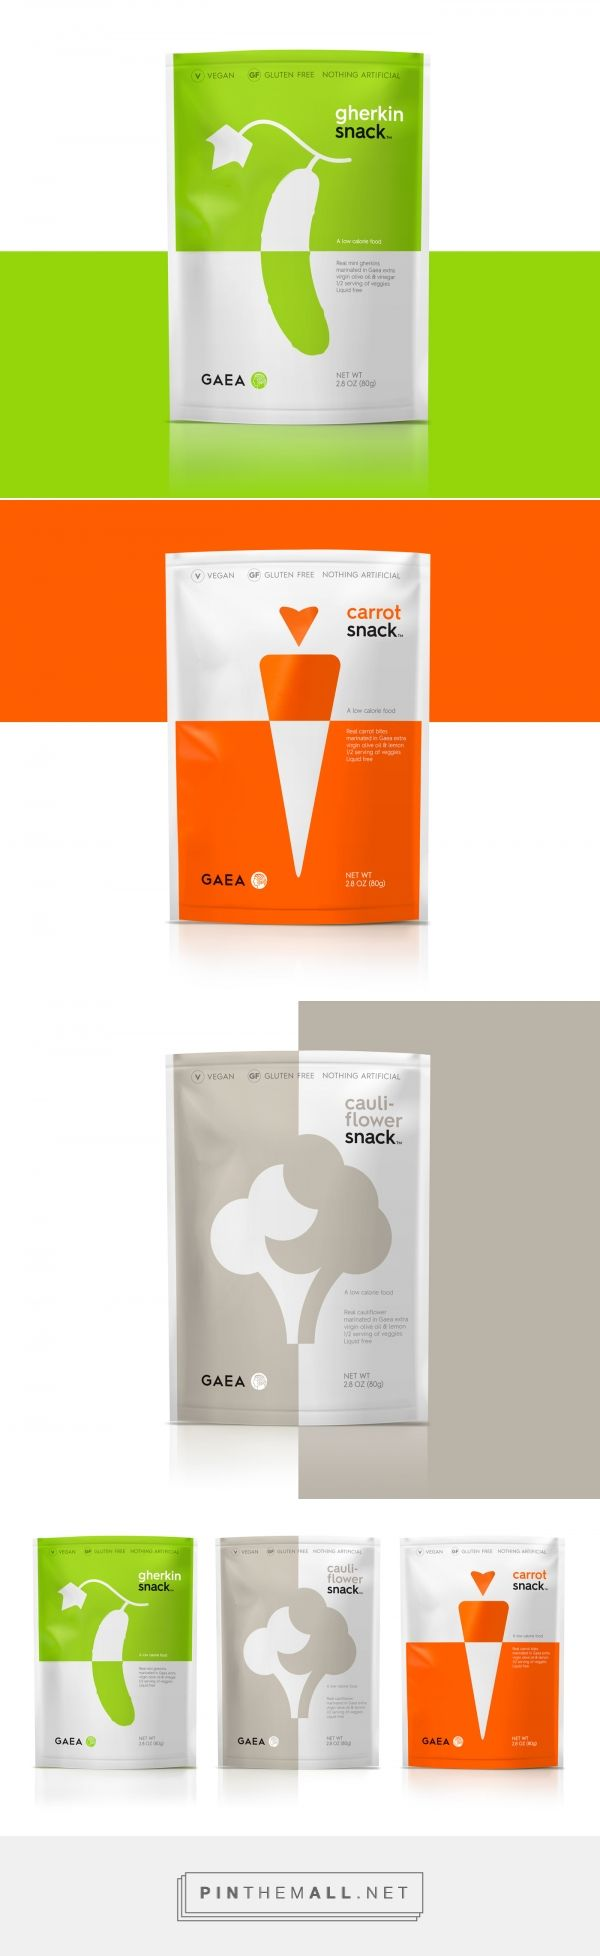 GAEA Vegan Snacks packaging design by Mousegraphics - http://www.packagingoftheworld.com/2018/01/gaea-vegan-snacks.html